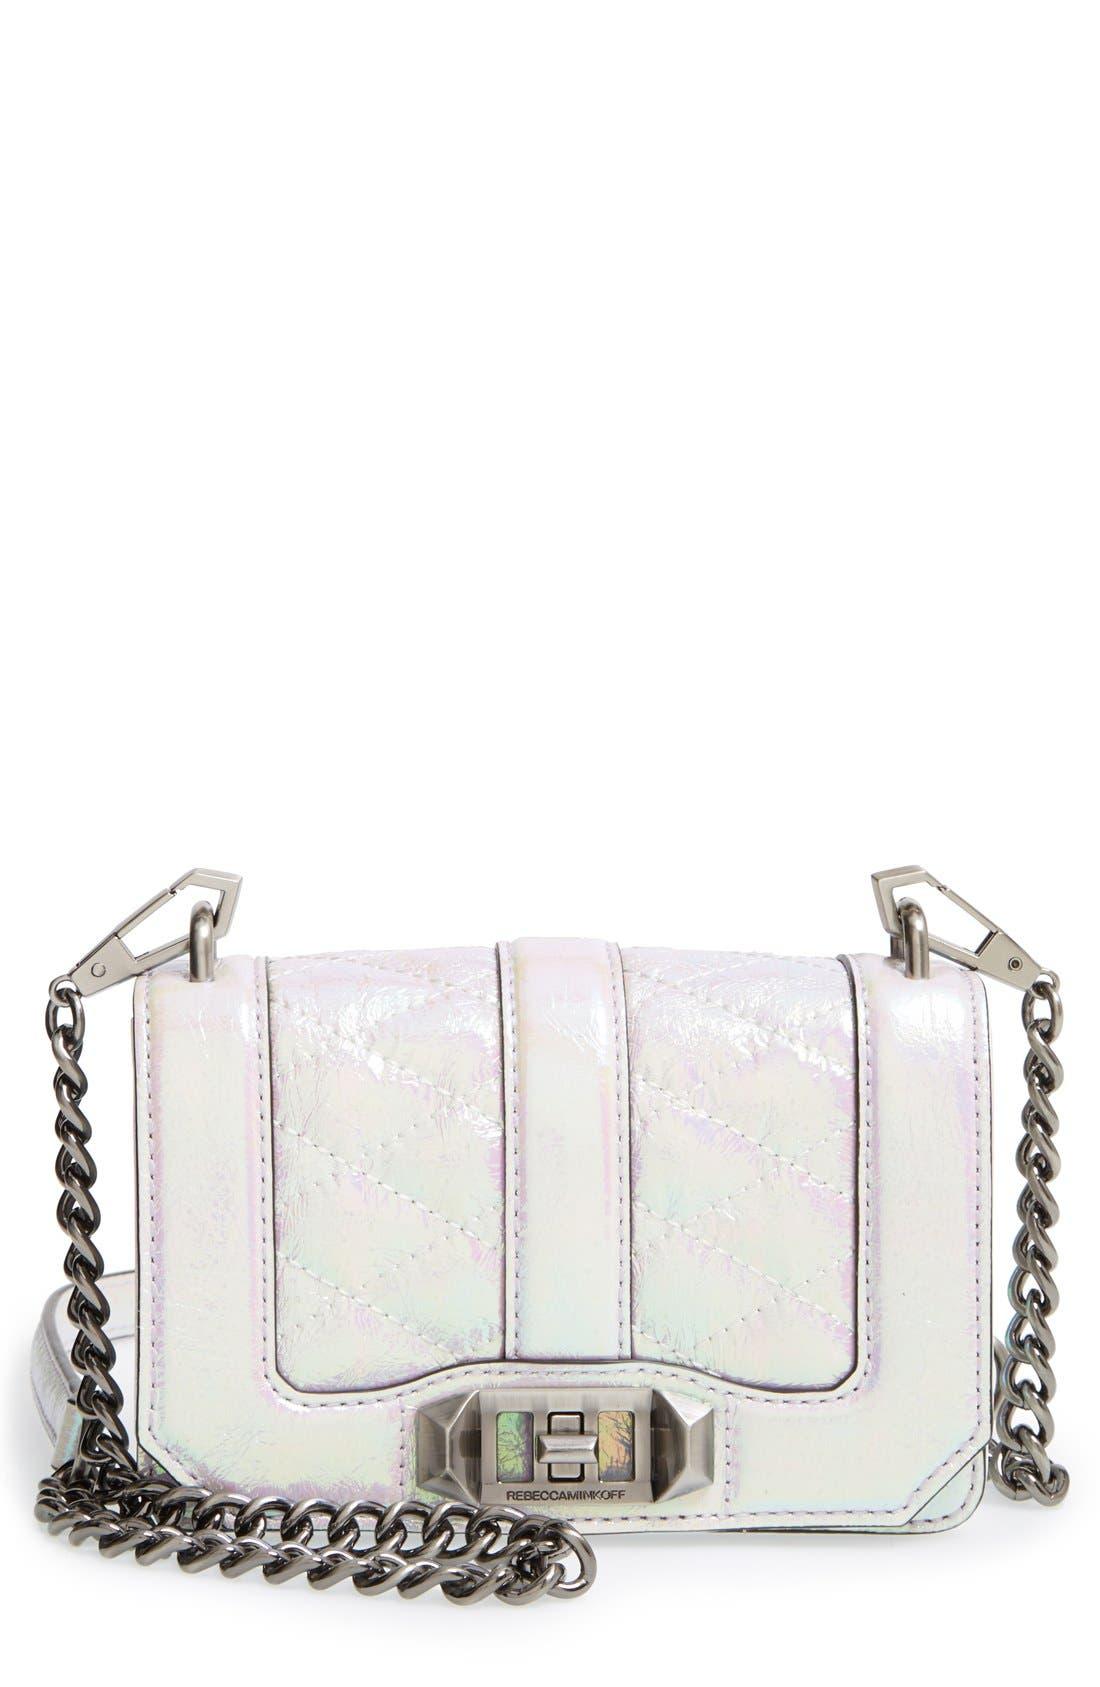 Main Image - Rebecca Minkoff 'Mini Love' Convertible Crossbody Bag